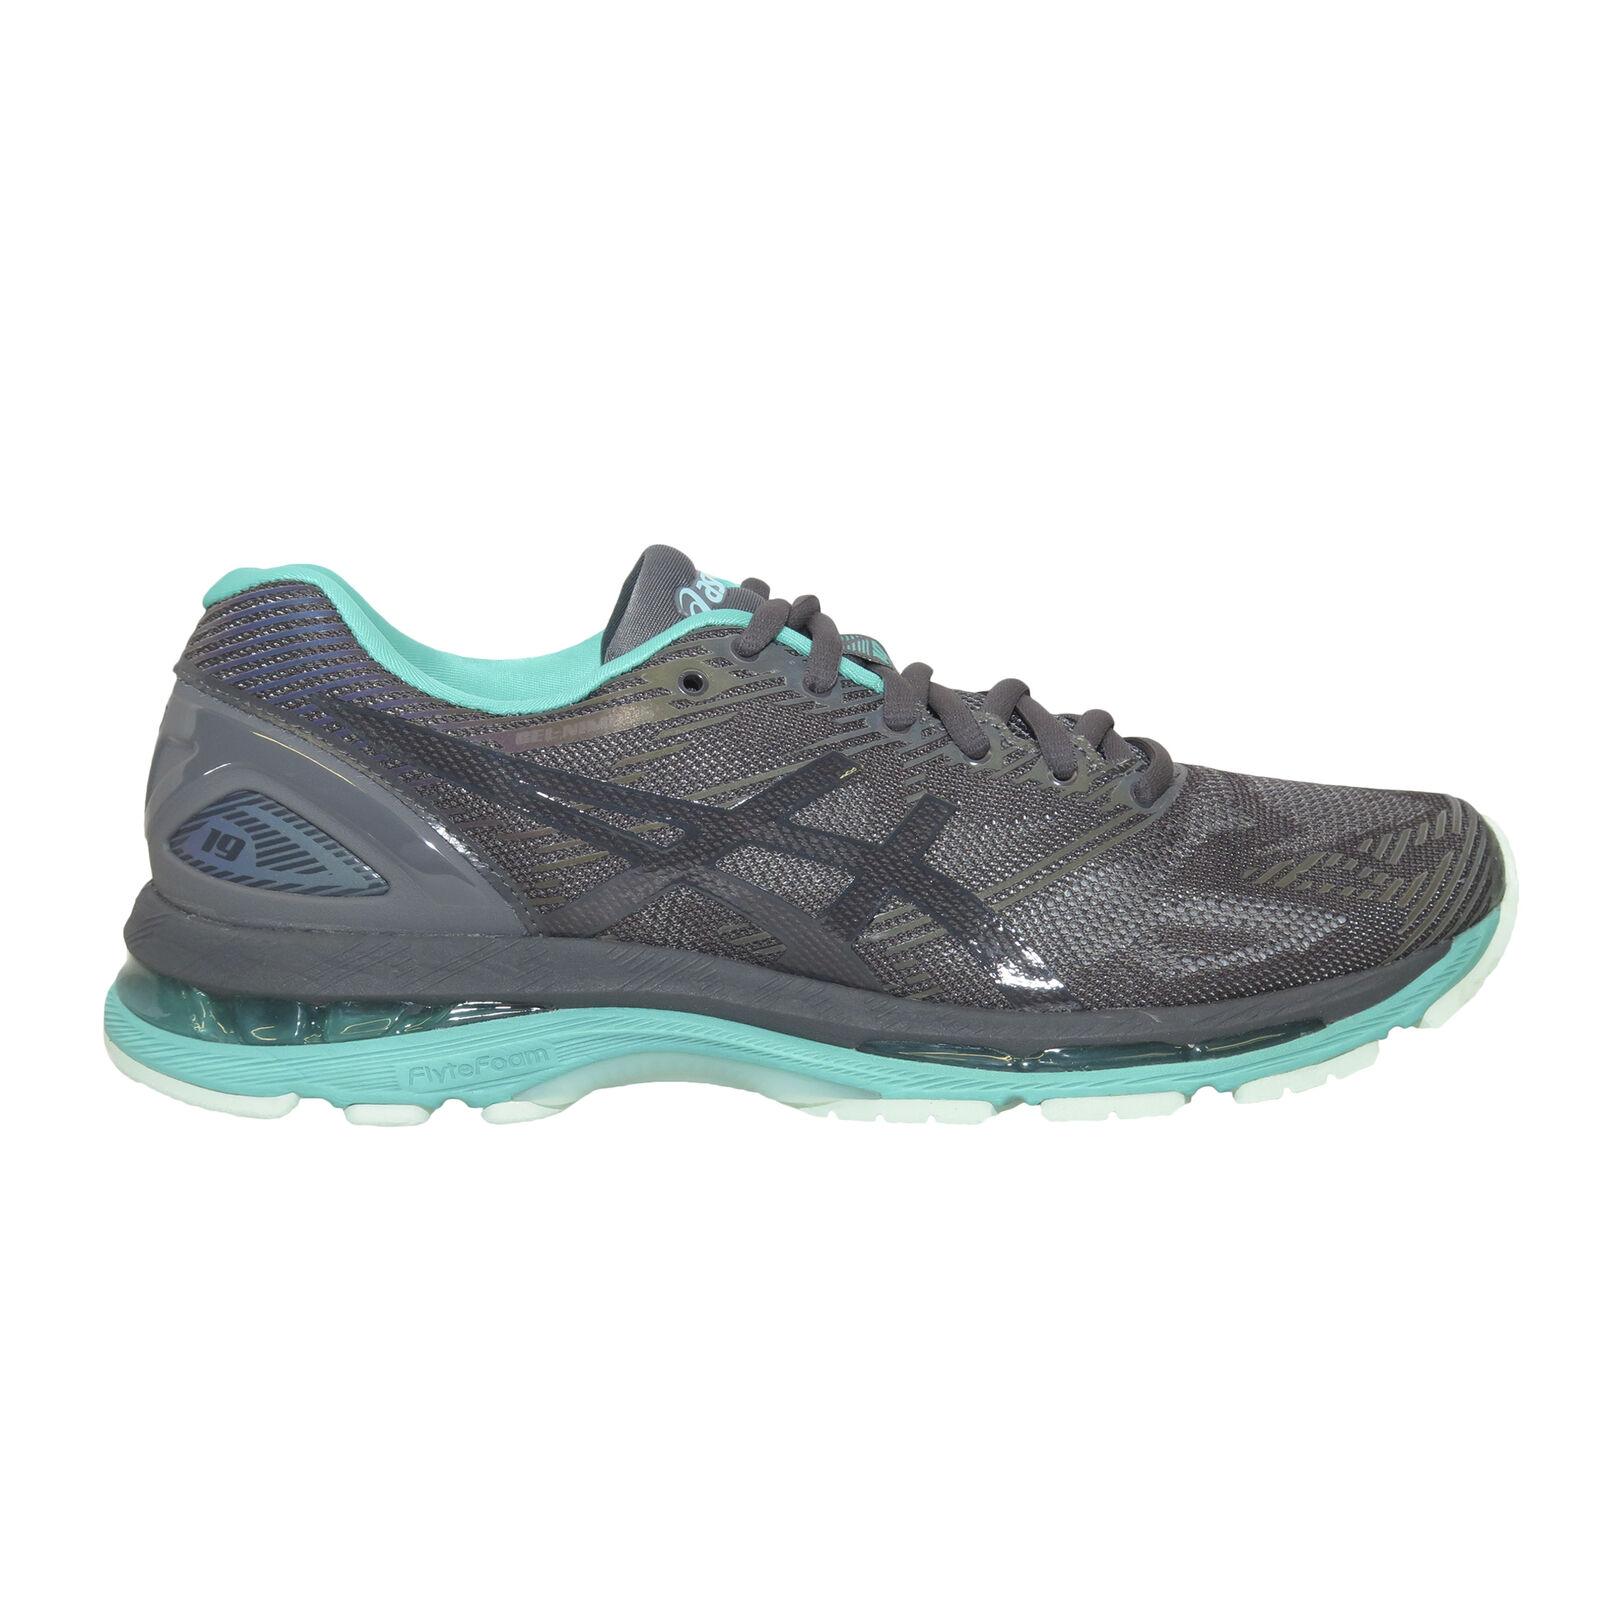 finest selection 42dbd 50834 Asics Gel-Nimbus 19 Lite Show Women- Ladies Neutral Running Shoes -  T7C8N-9590